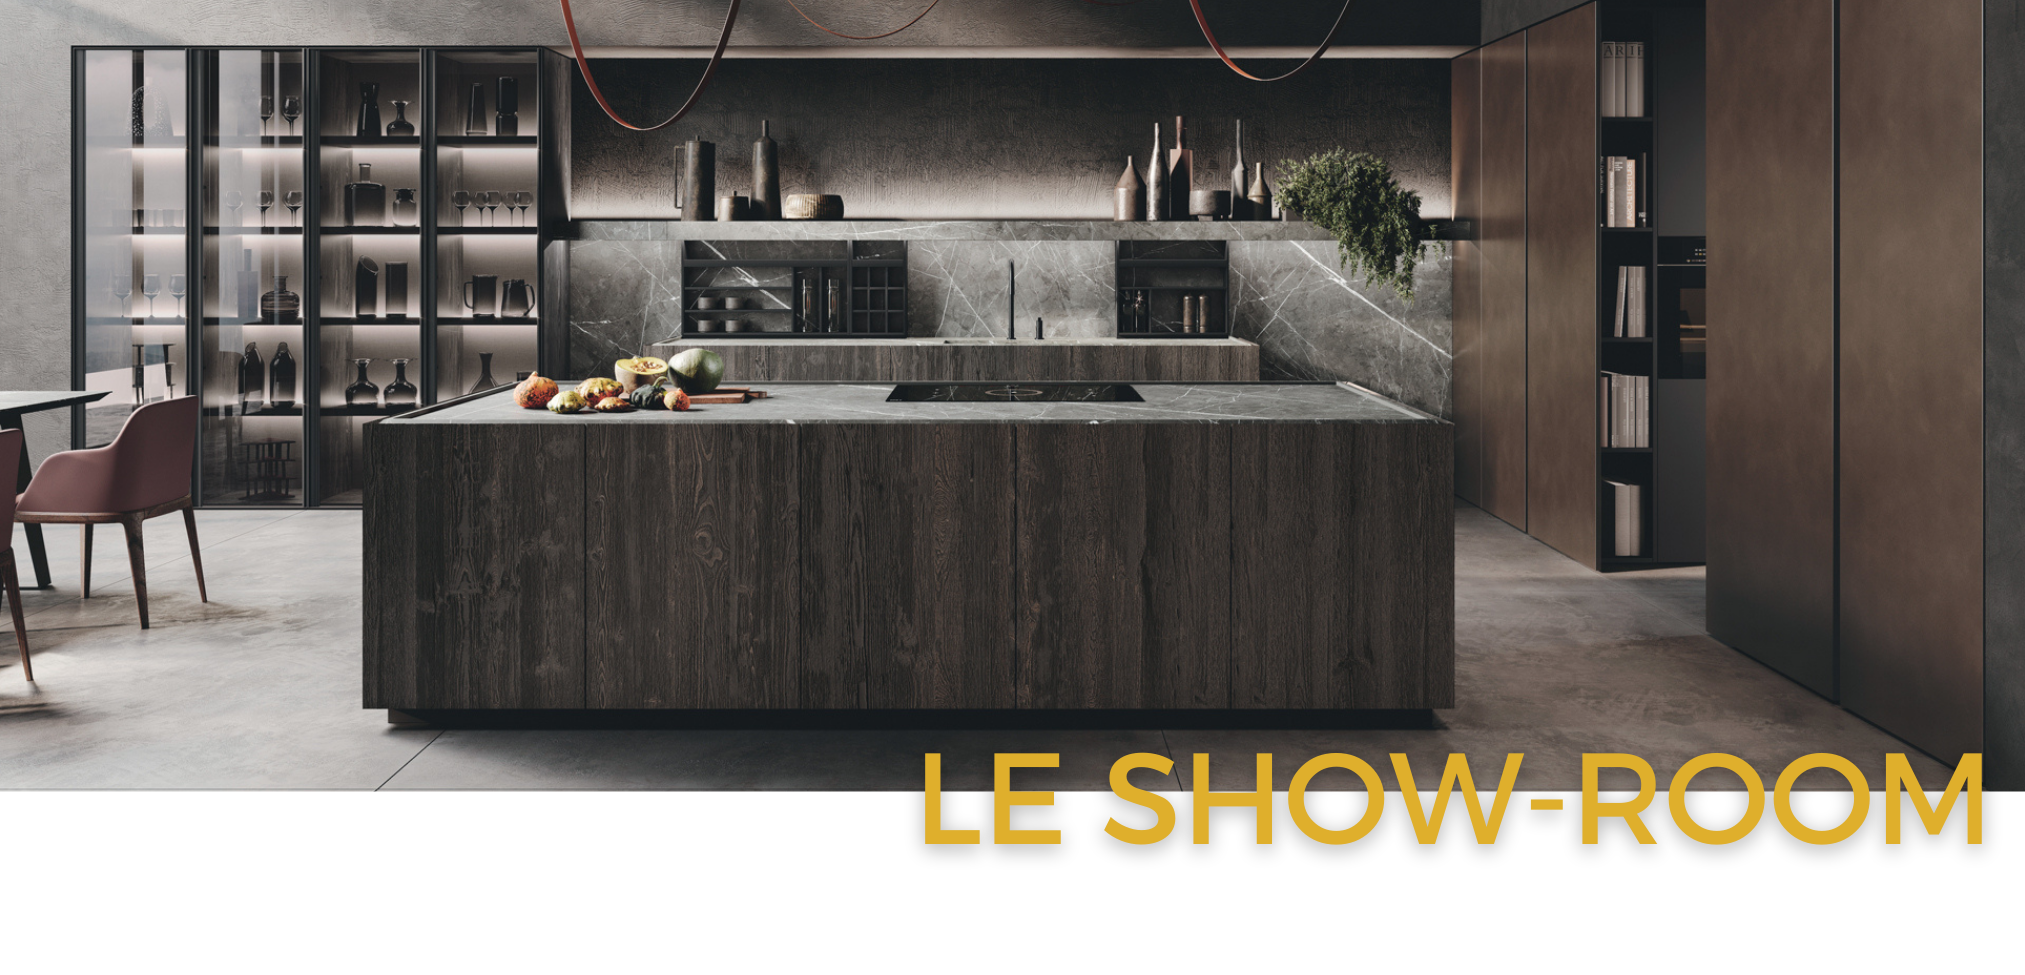 Binova & Armony cuisine - Showroom La Garenne Colombes - bandeau showroom